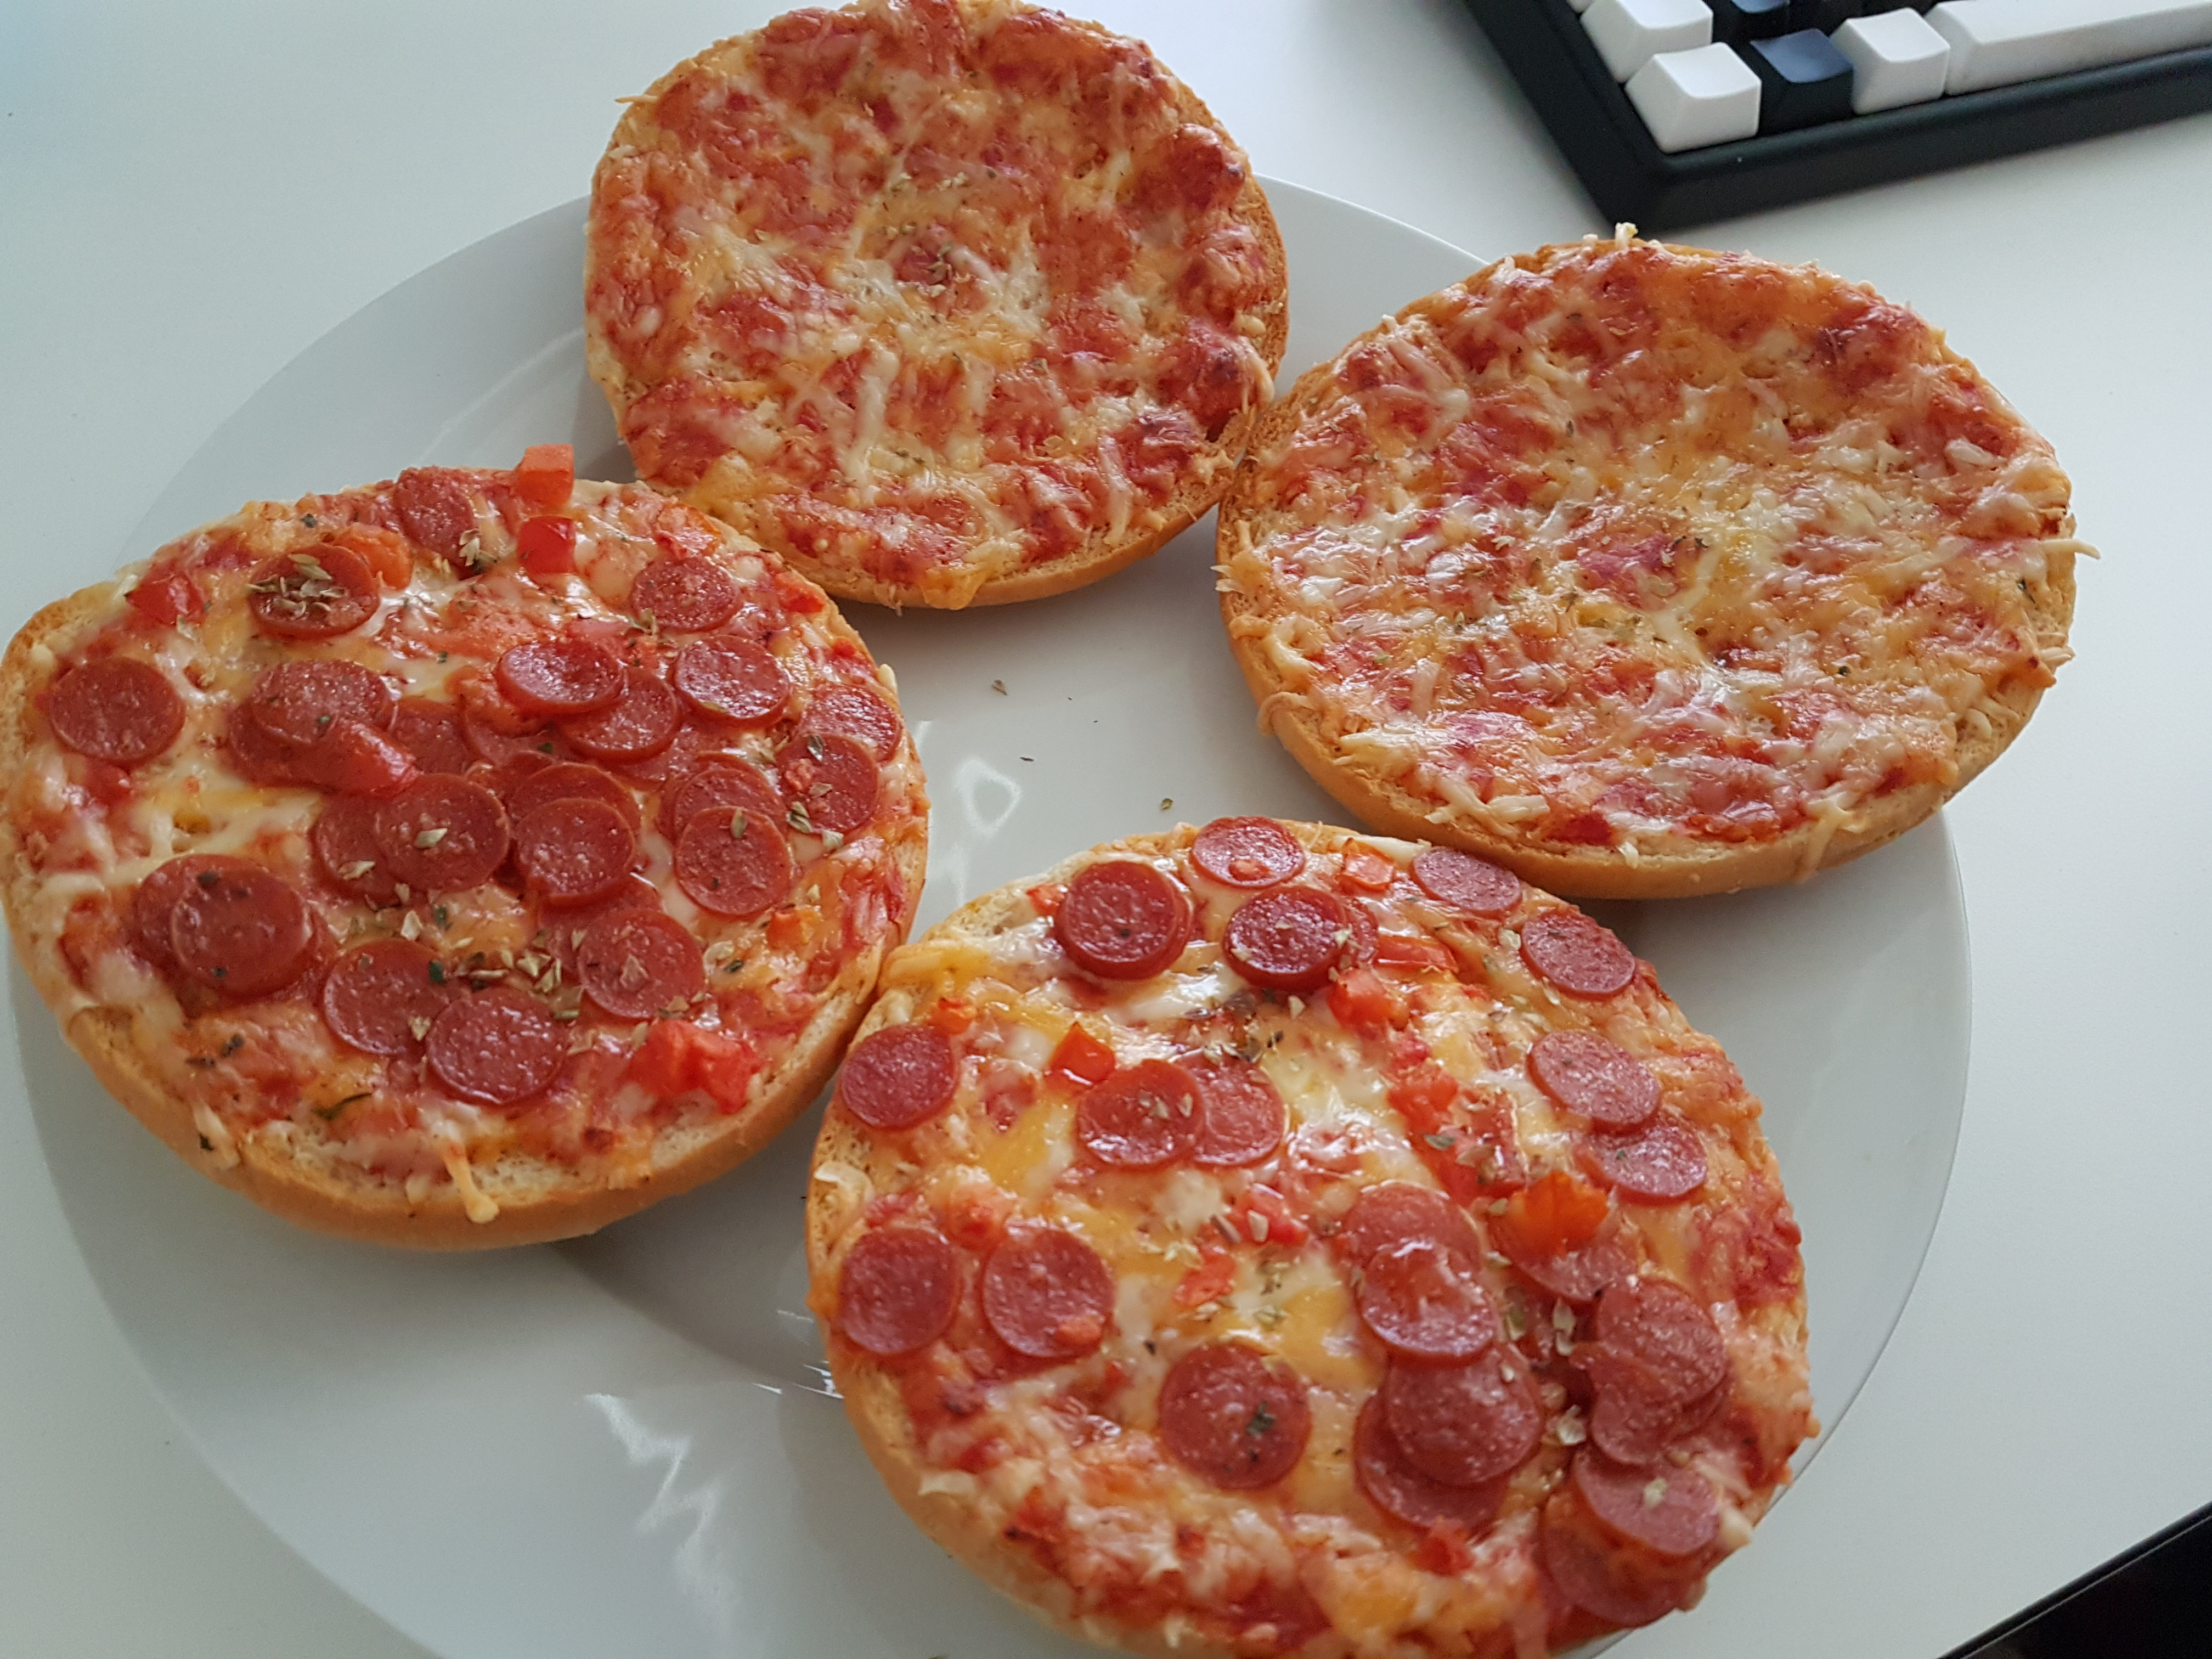 https://foodloader.net/Holz_2018-02-25_Pizzaburger.jpg